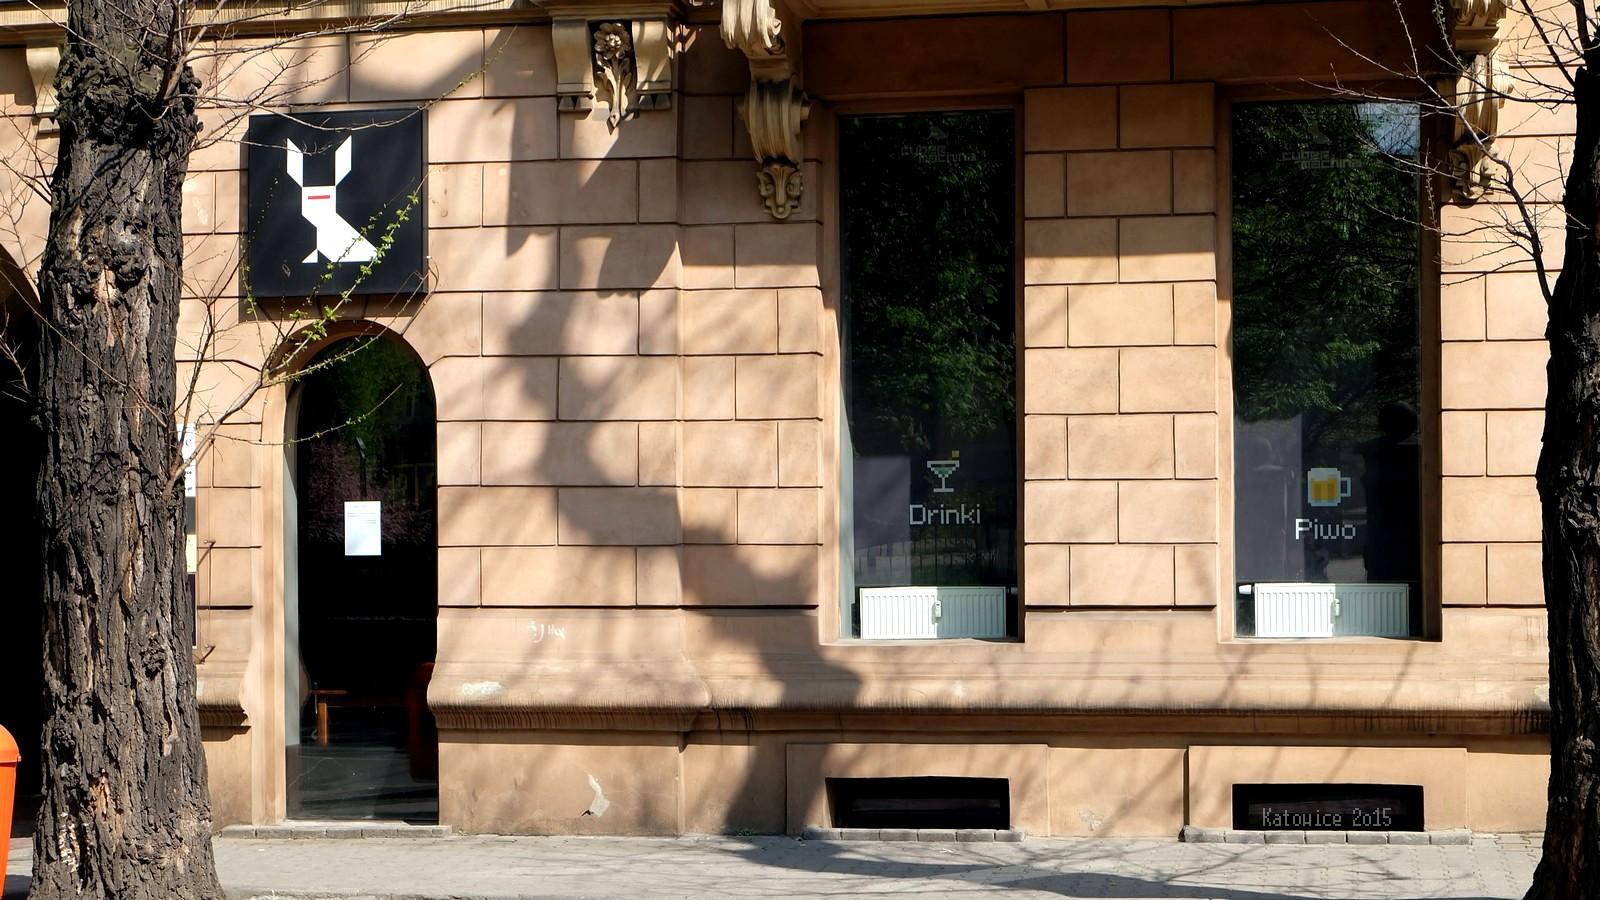 Cybermachina, Damrota, Katowice, Polska